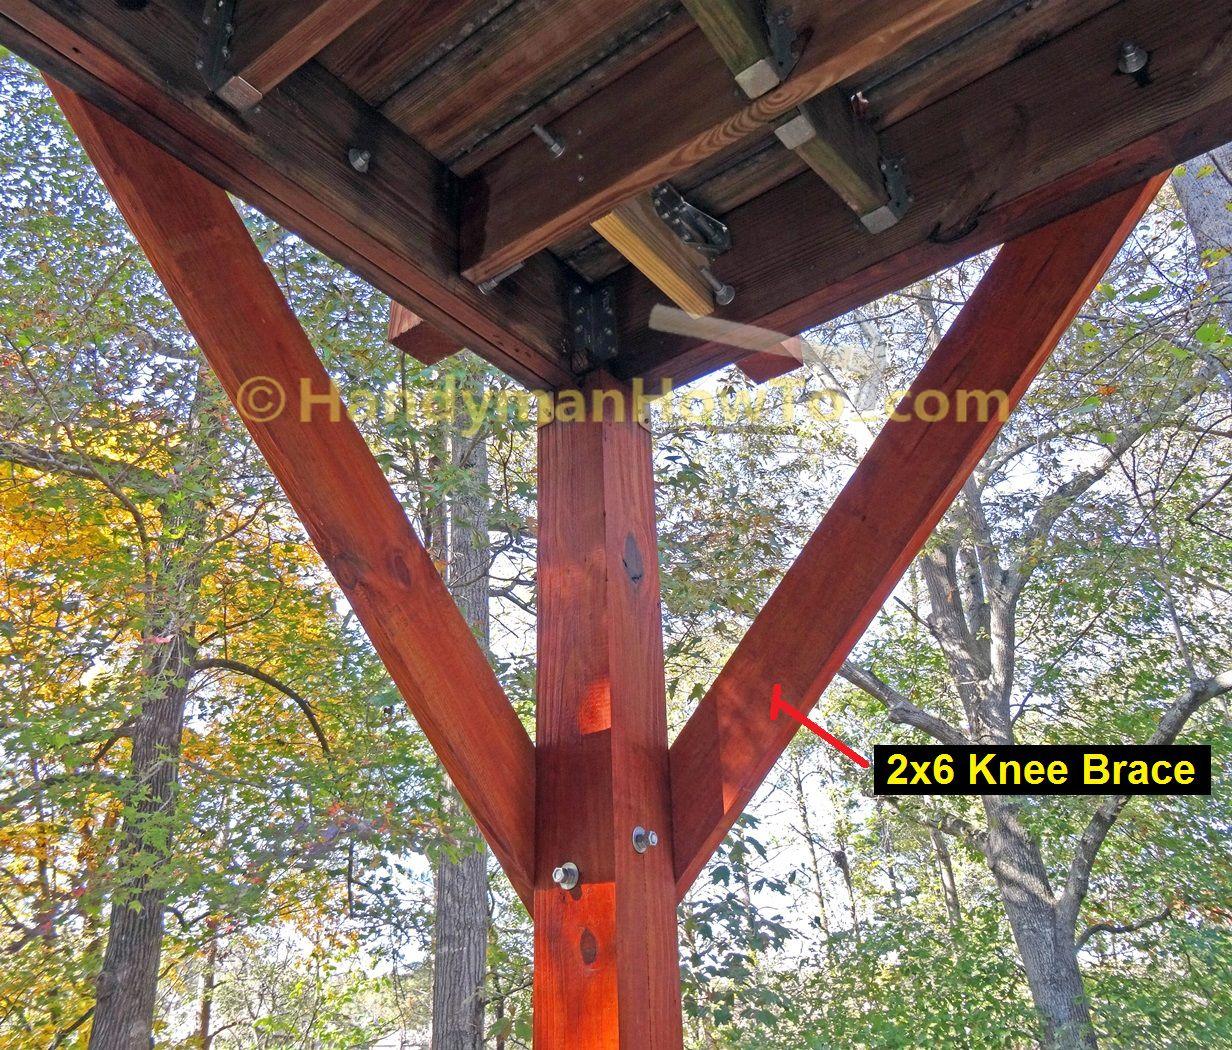 How To Install Deck Post Knee Braces Deck Posts Wood Deck Deck